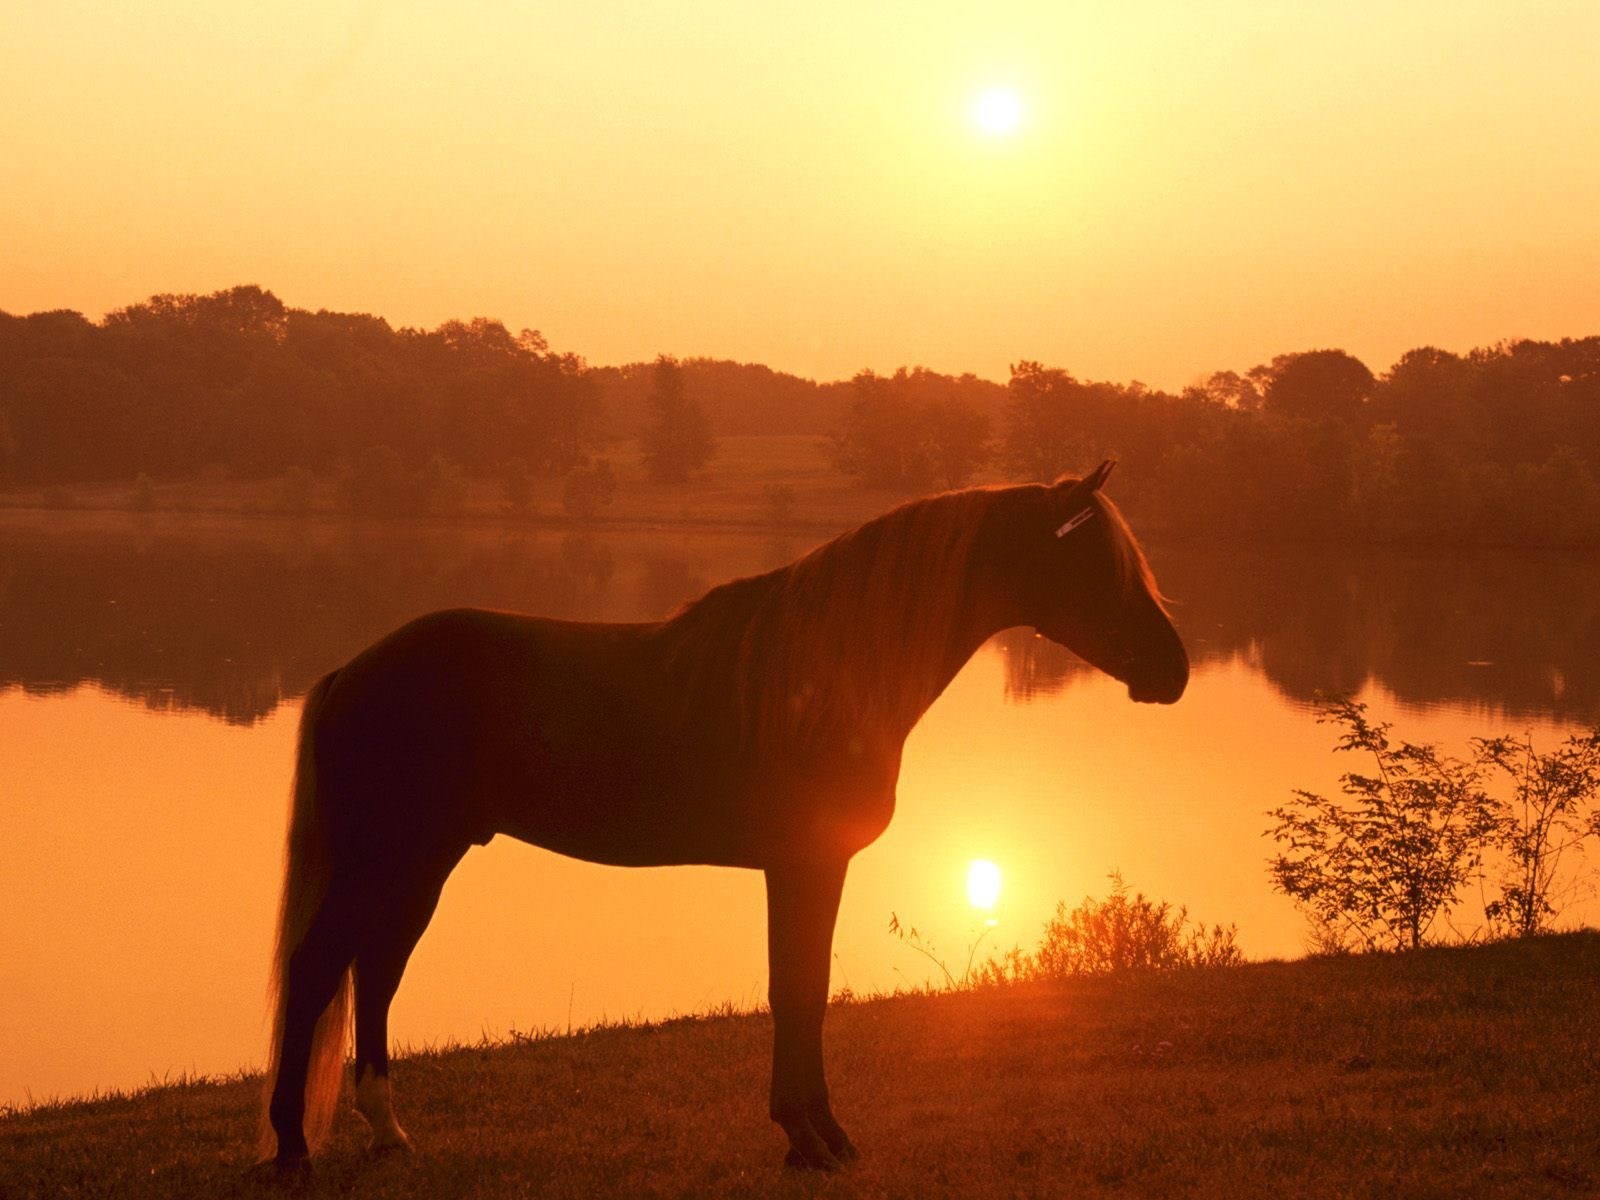 Beautiful Wallpaper Horse Sunrise - 0e46541b02a83e04c4e7f42707599a18  Pic_834065.jpg